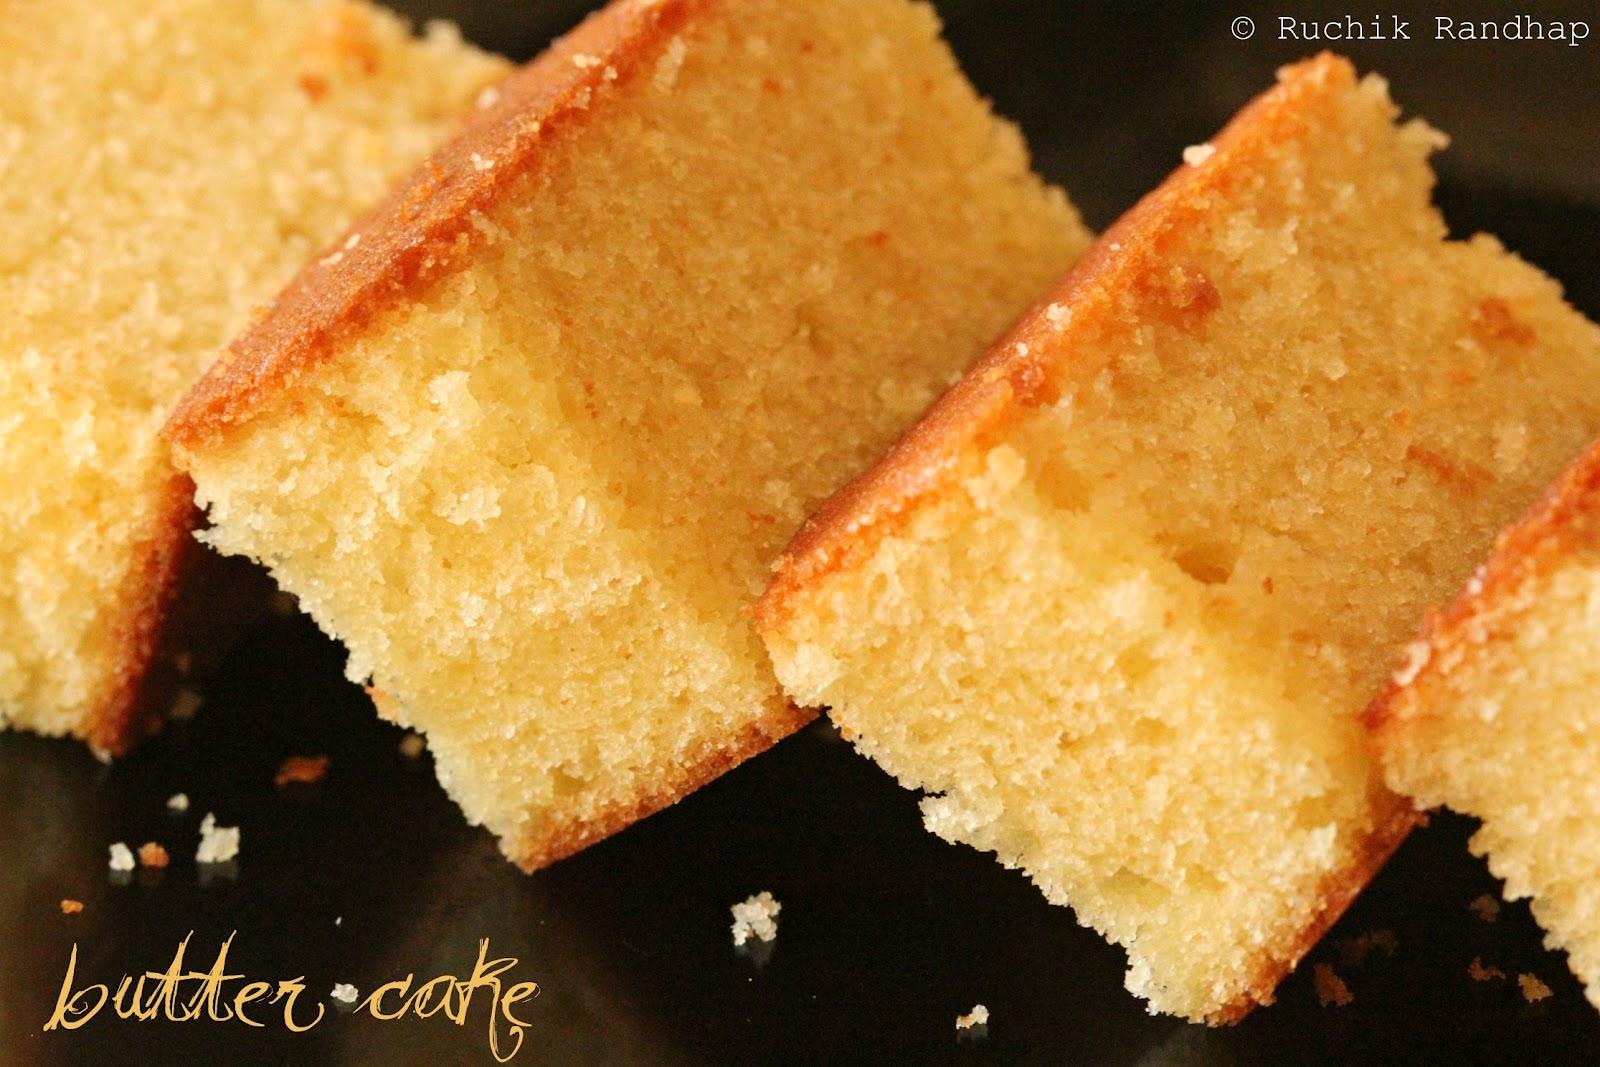 Butter Cake - Simply Delicious!! - Ruchik Randhap